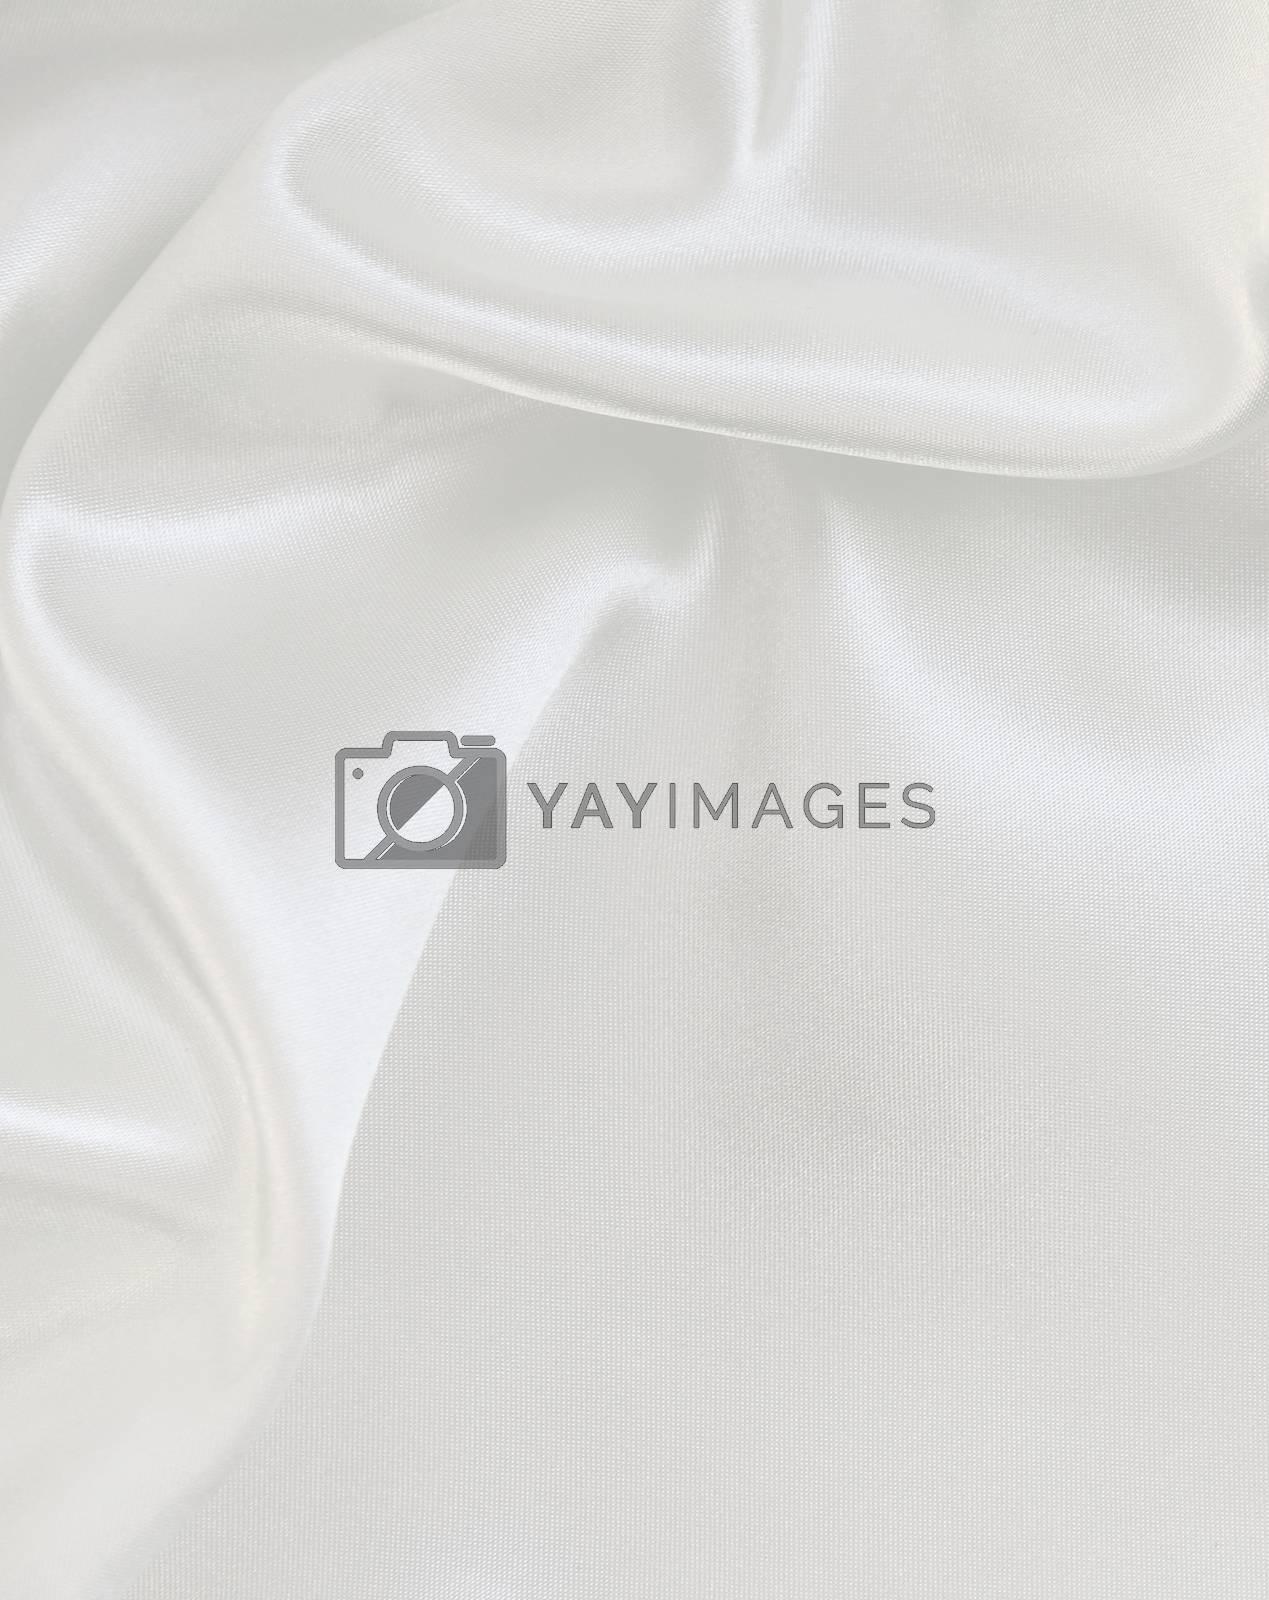 Royalty free image of Smooth elegant white silk as wedding background by oxanatravel